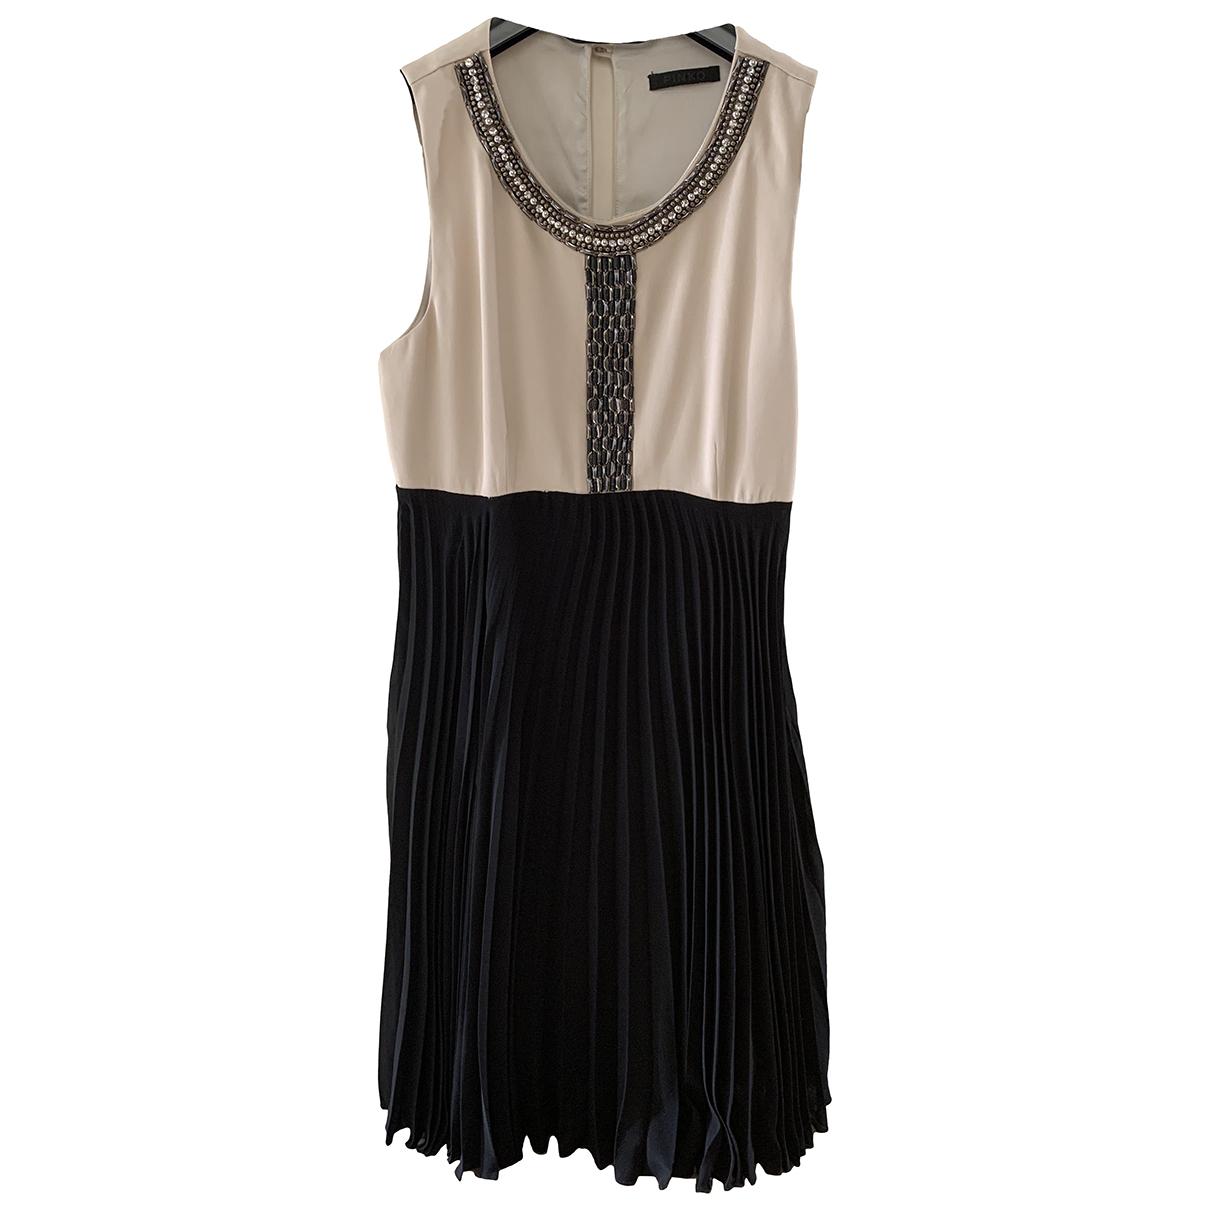 Pinko \N Kleid in  Schwarz Synthetik